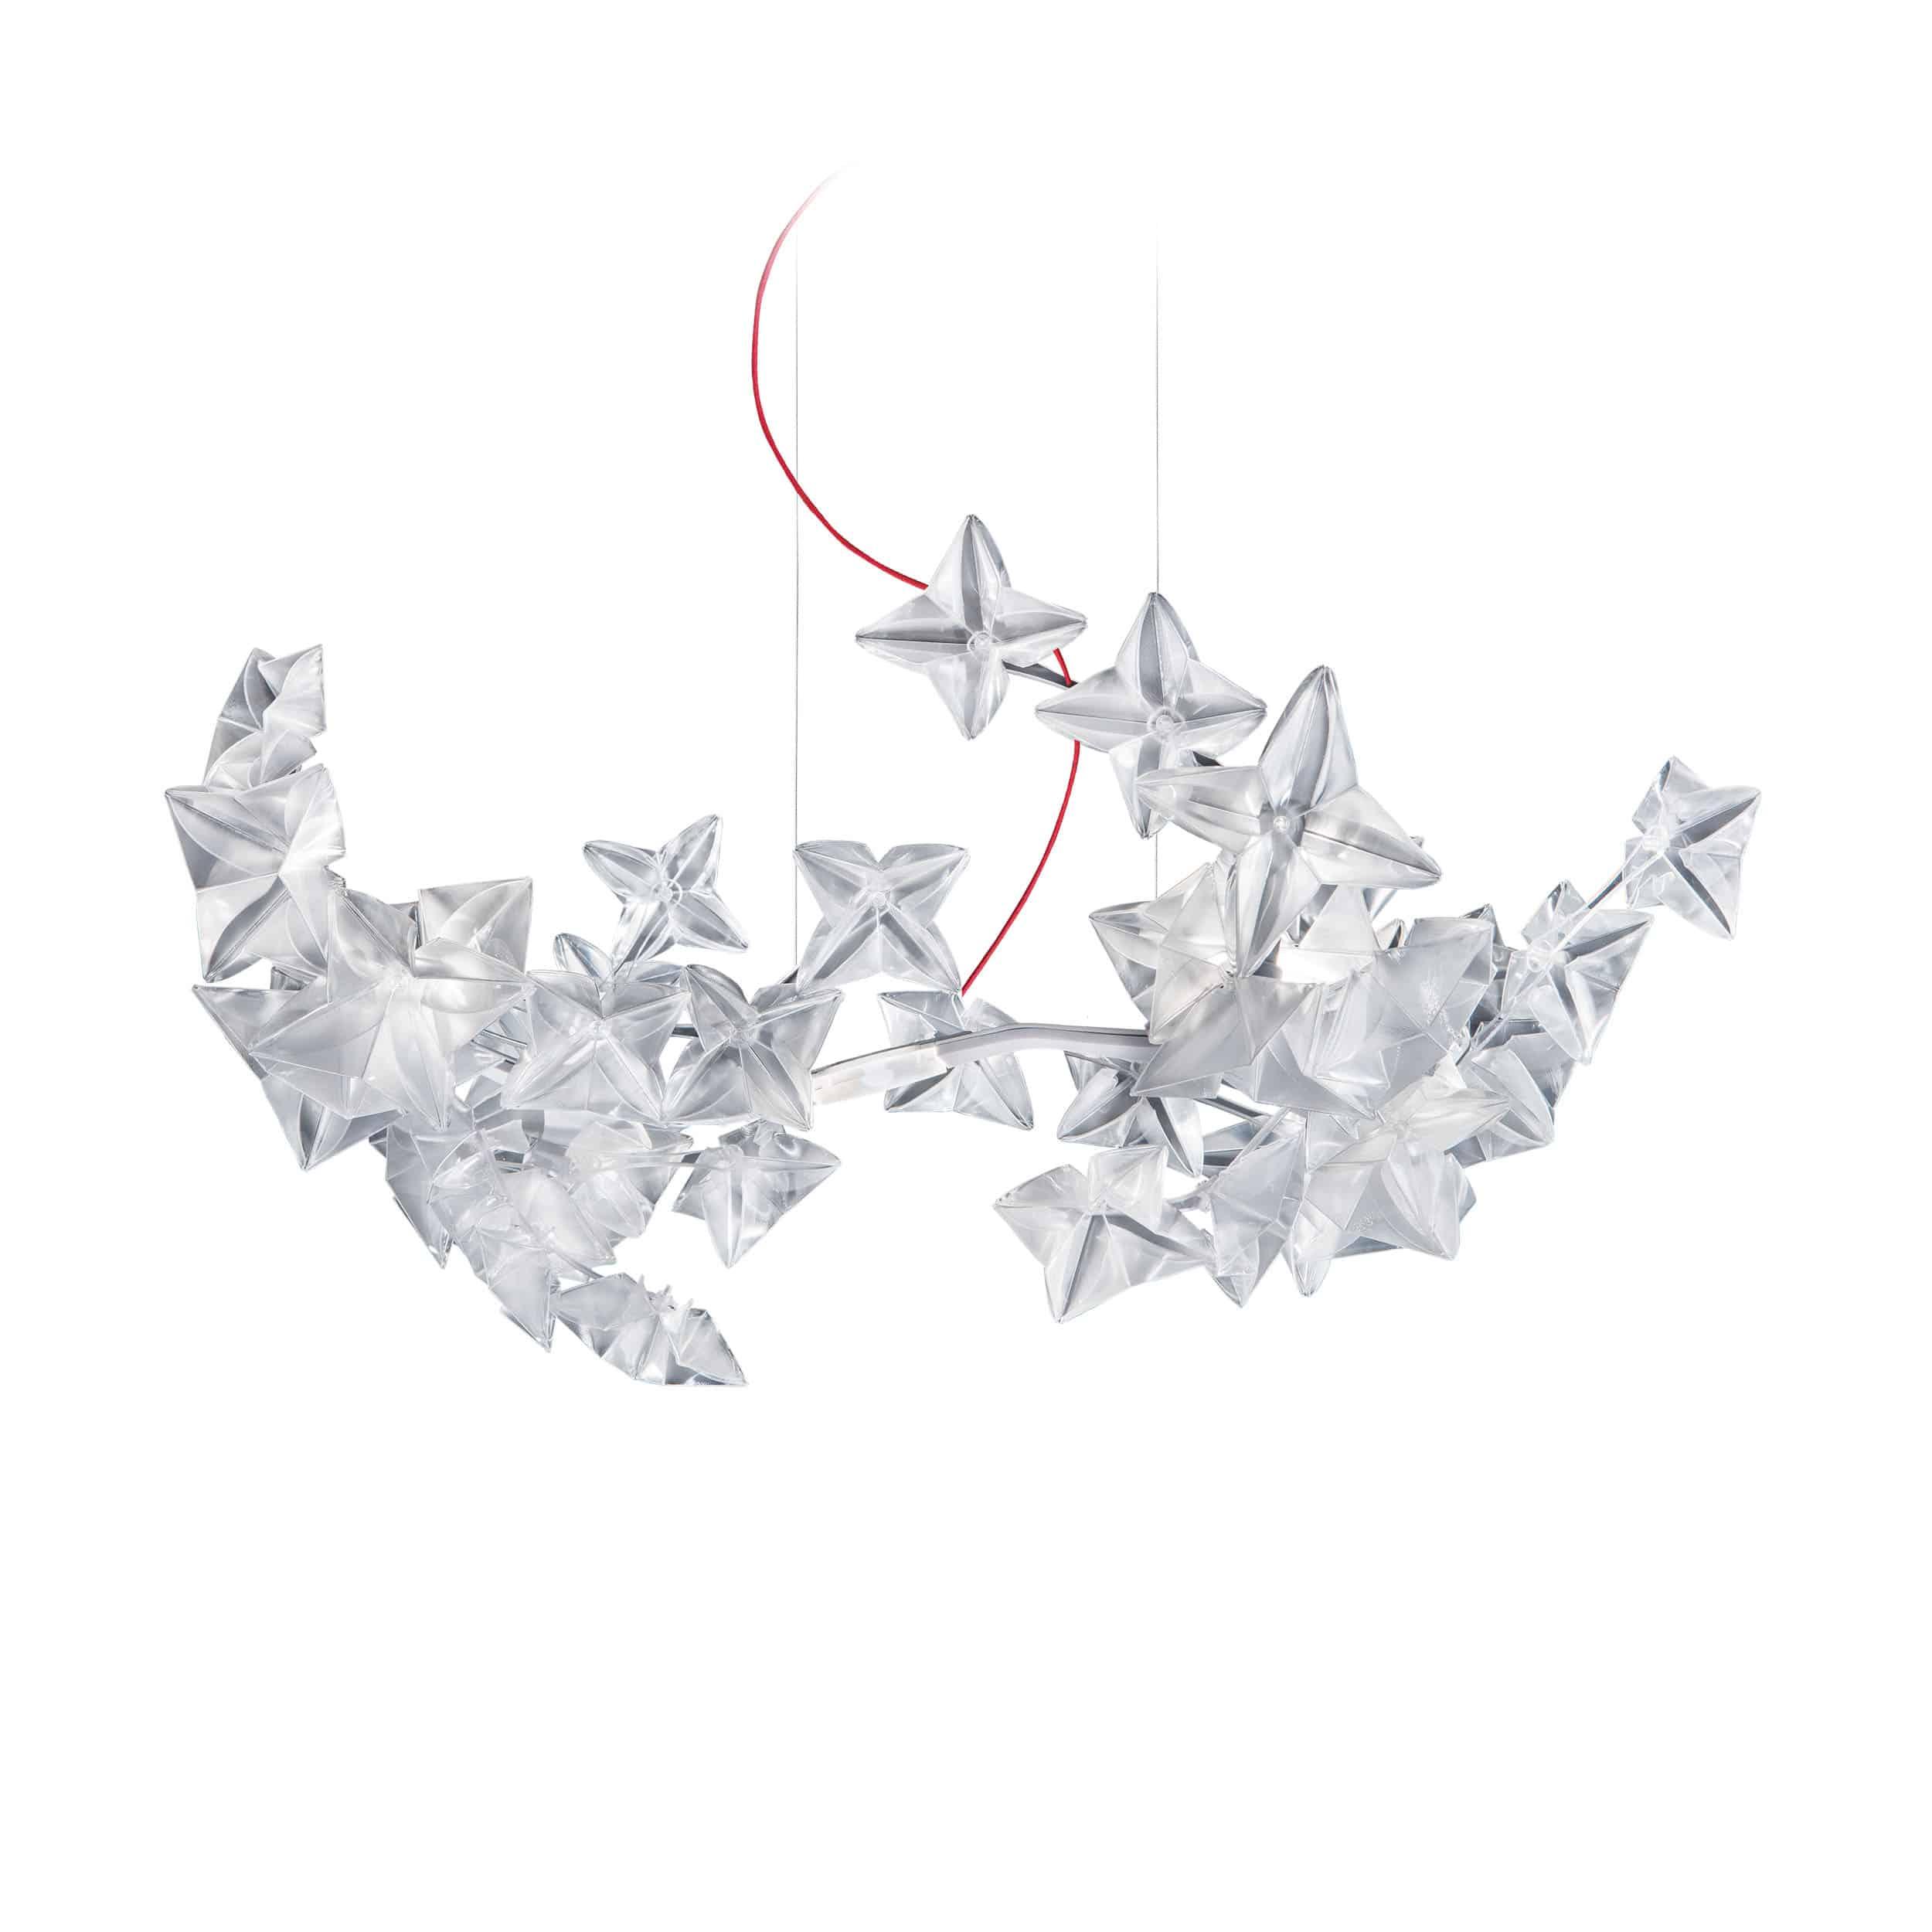 Hanami LED Pendelleuchte